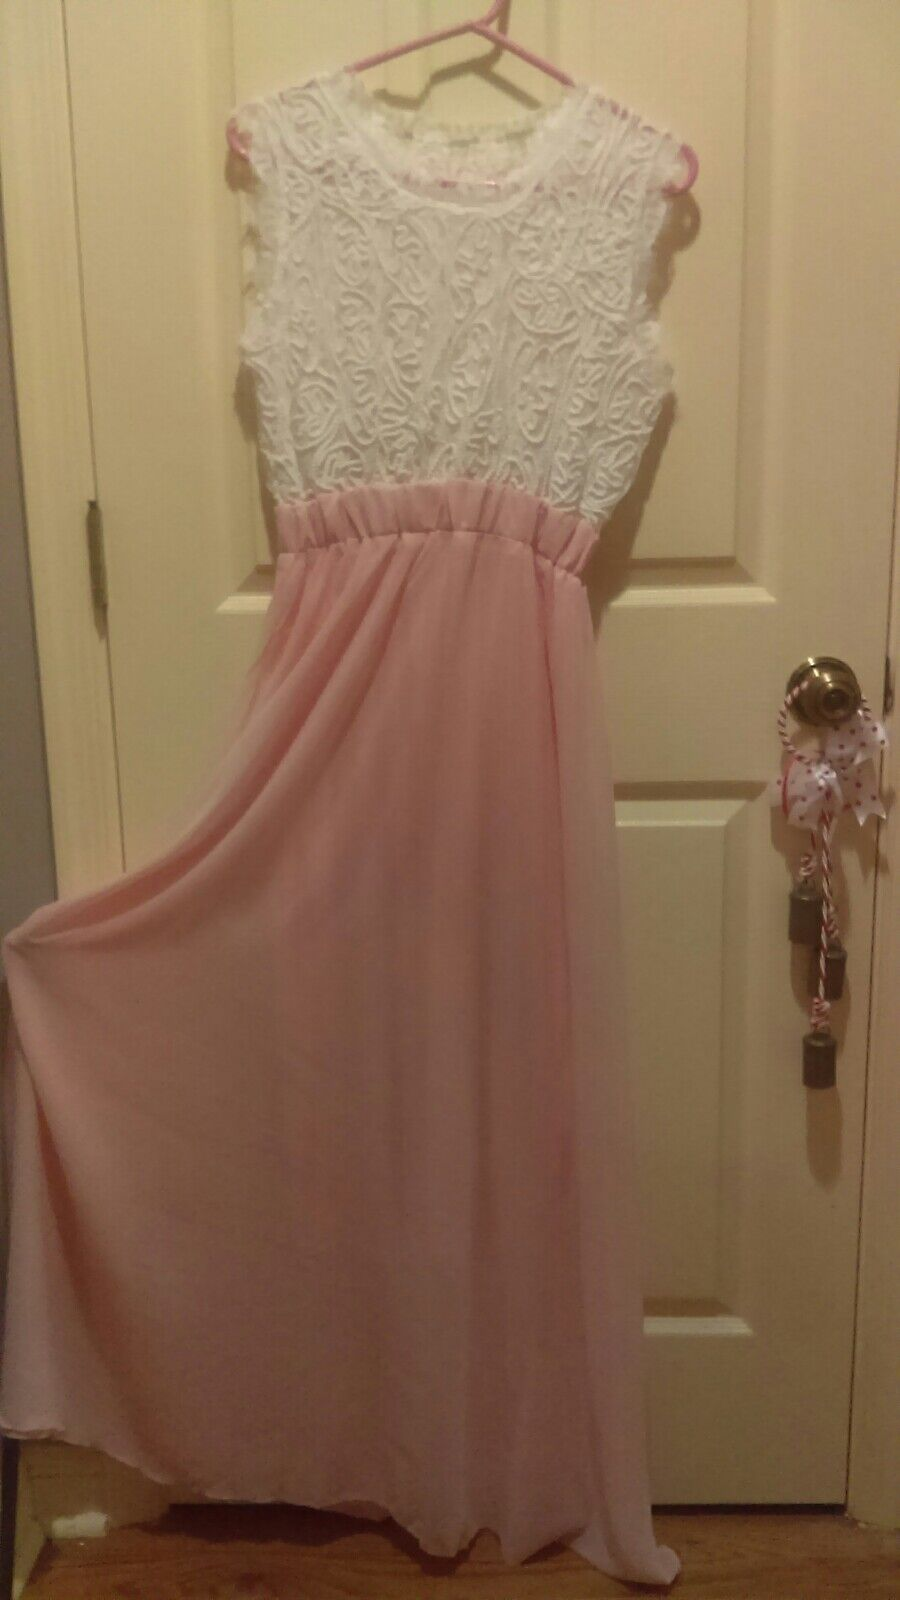 Ladys Lace top Brides Maid long elegant flowing Evening / Party / Wedding dress